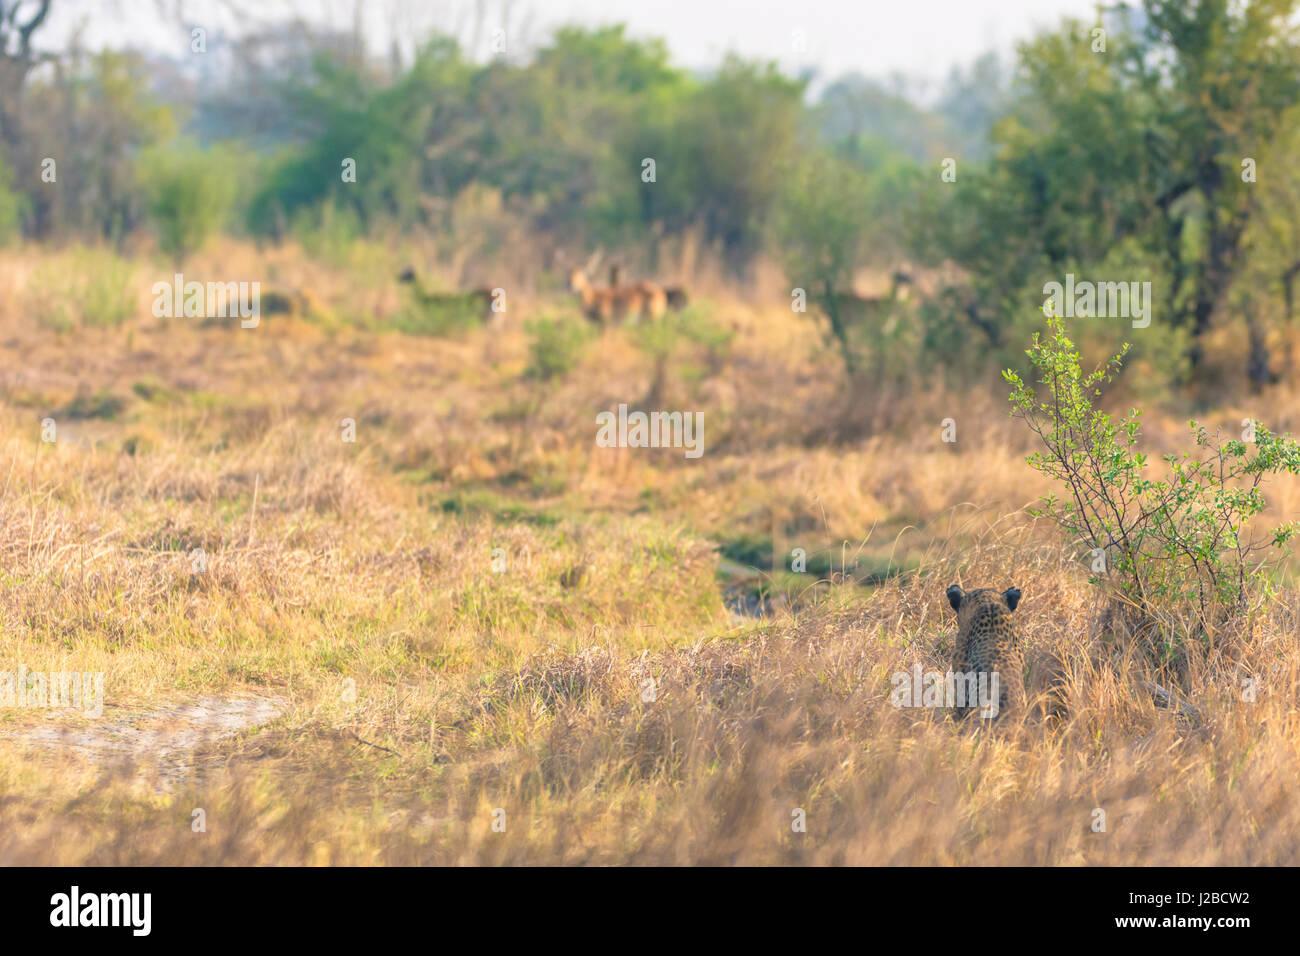 Botswana. Okavango Delta. Khwai Concession. Female leopard (Panthera pardus) in the tall grass stalking reedbuck. - Stock Image